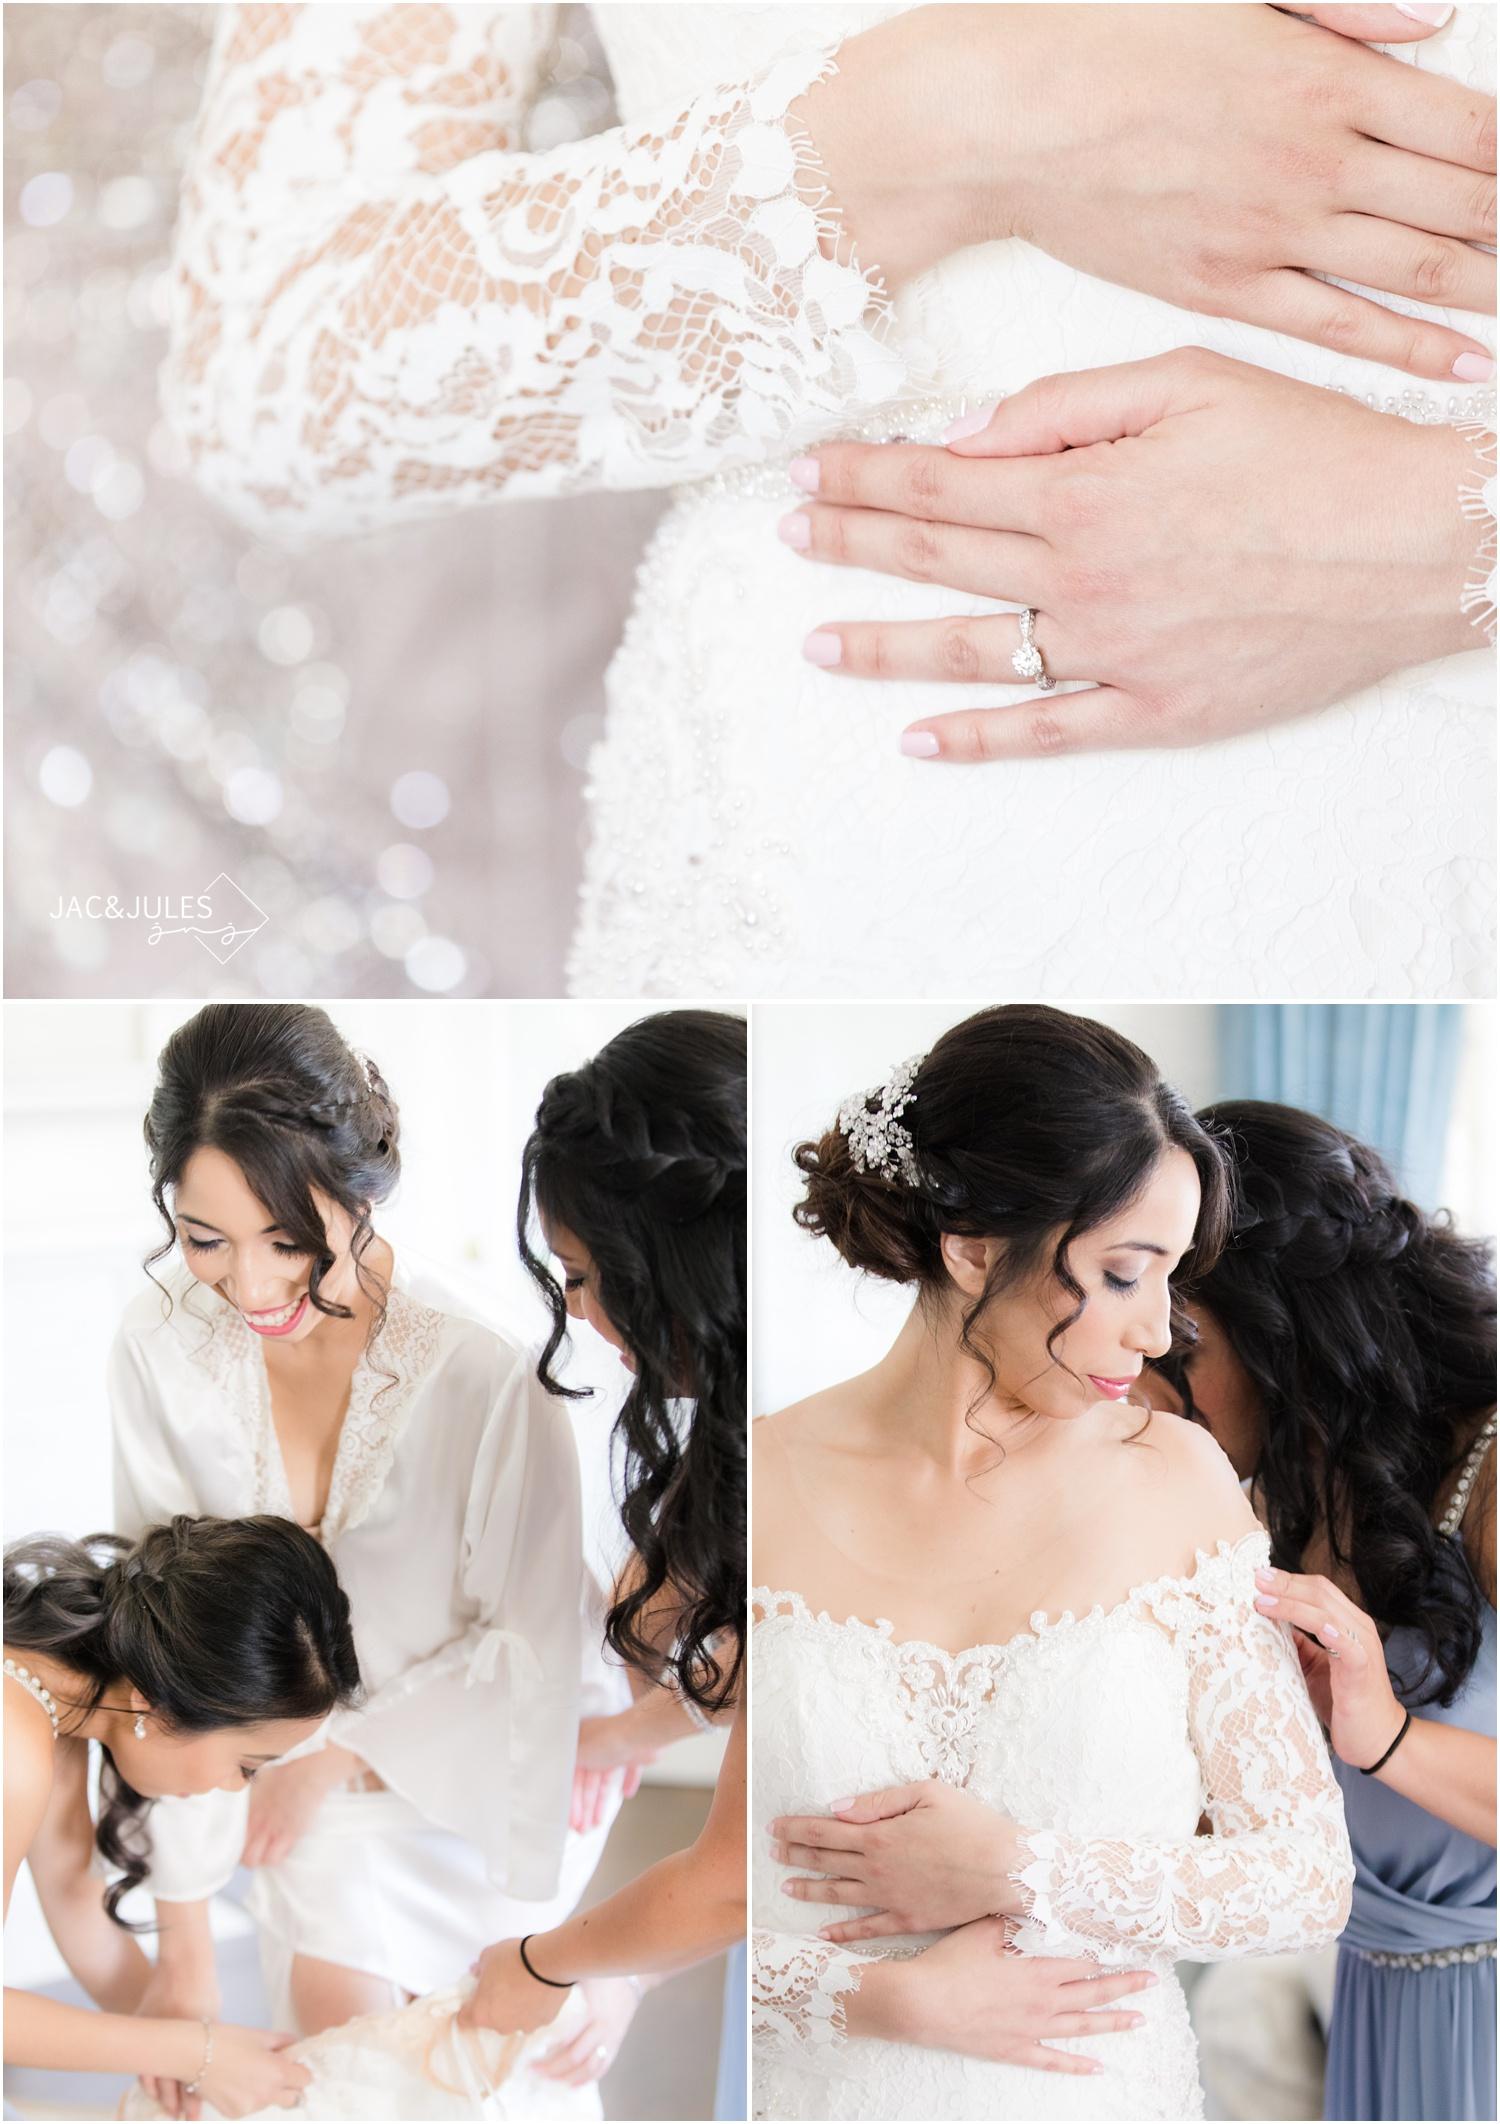 Bridal getting dressed at The Shadowbrook in Shrewsbury, NJ.